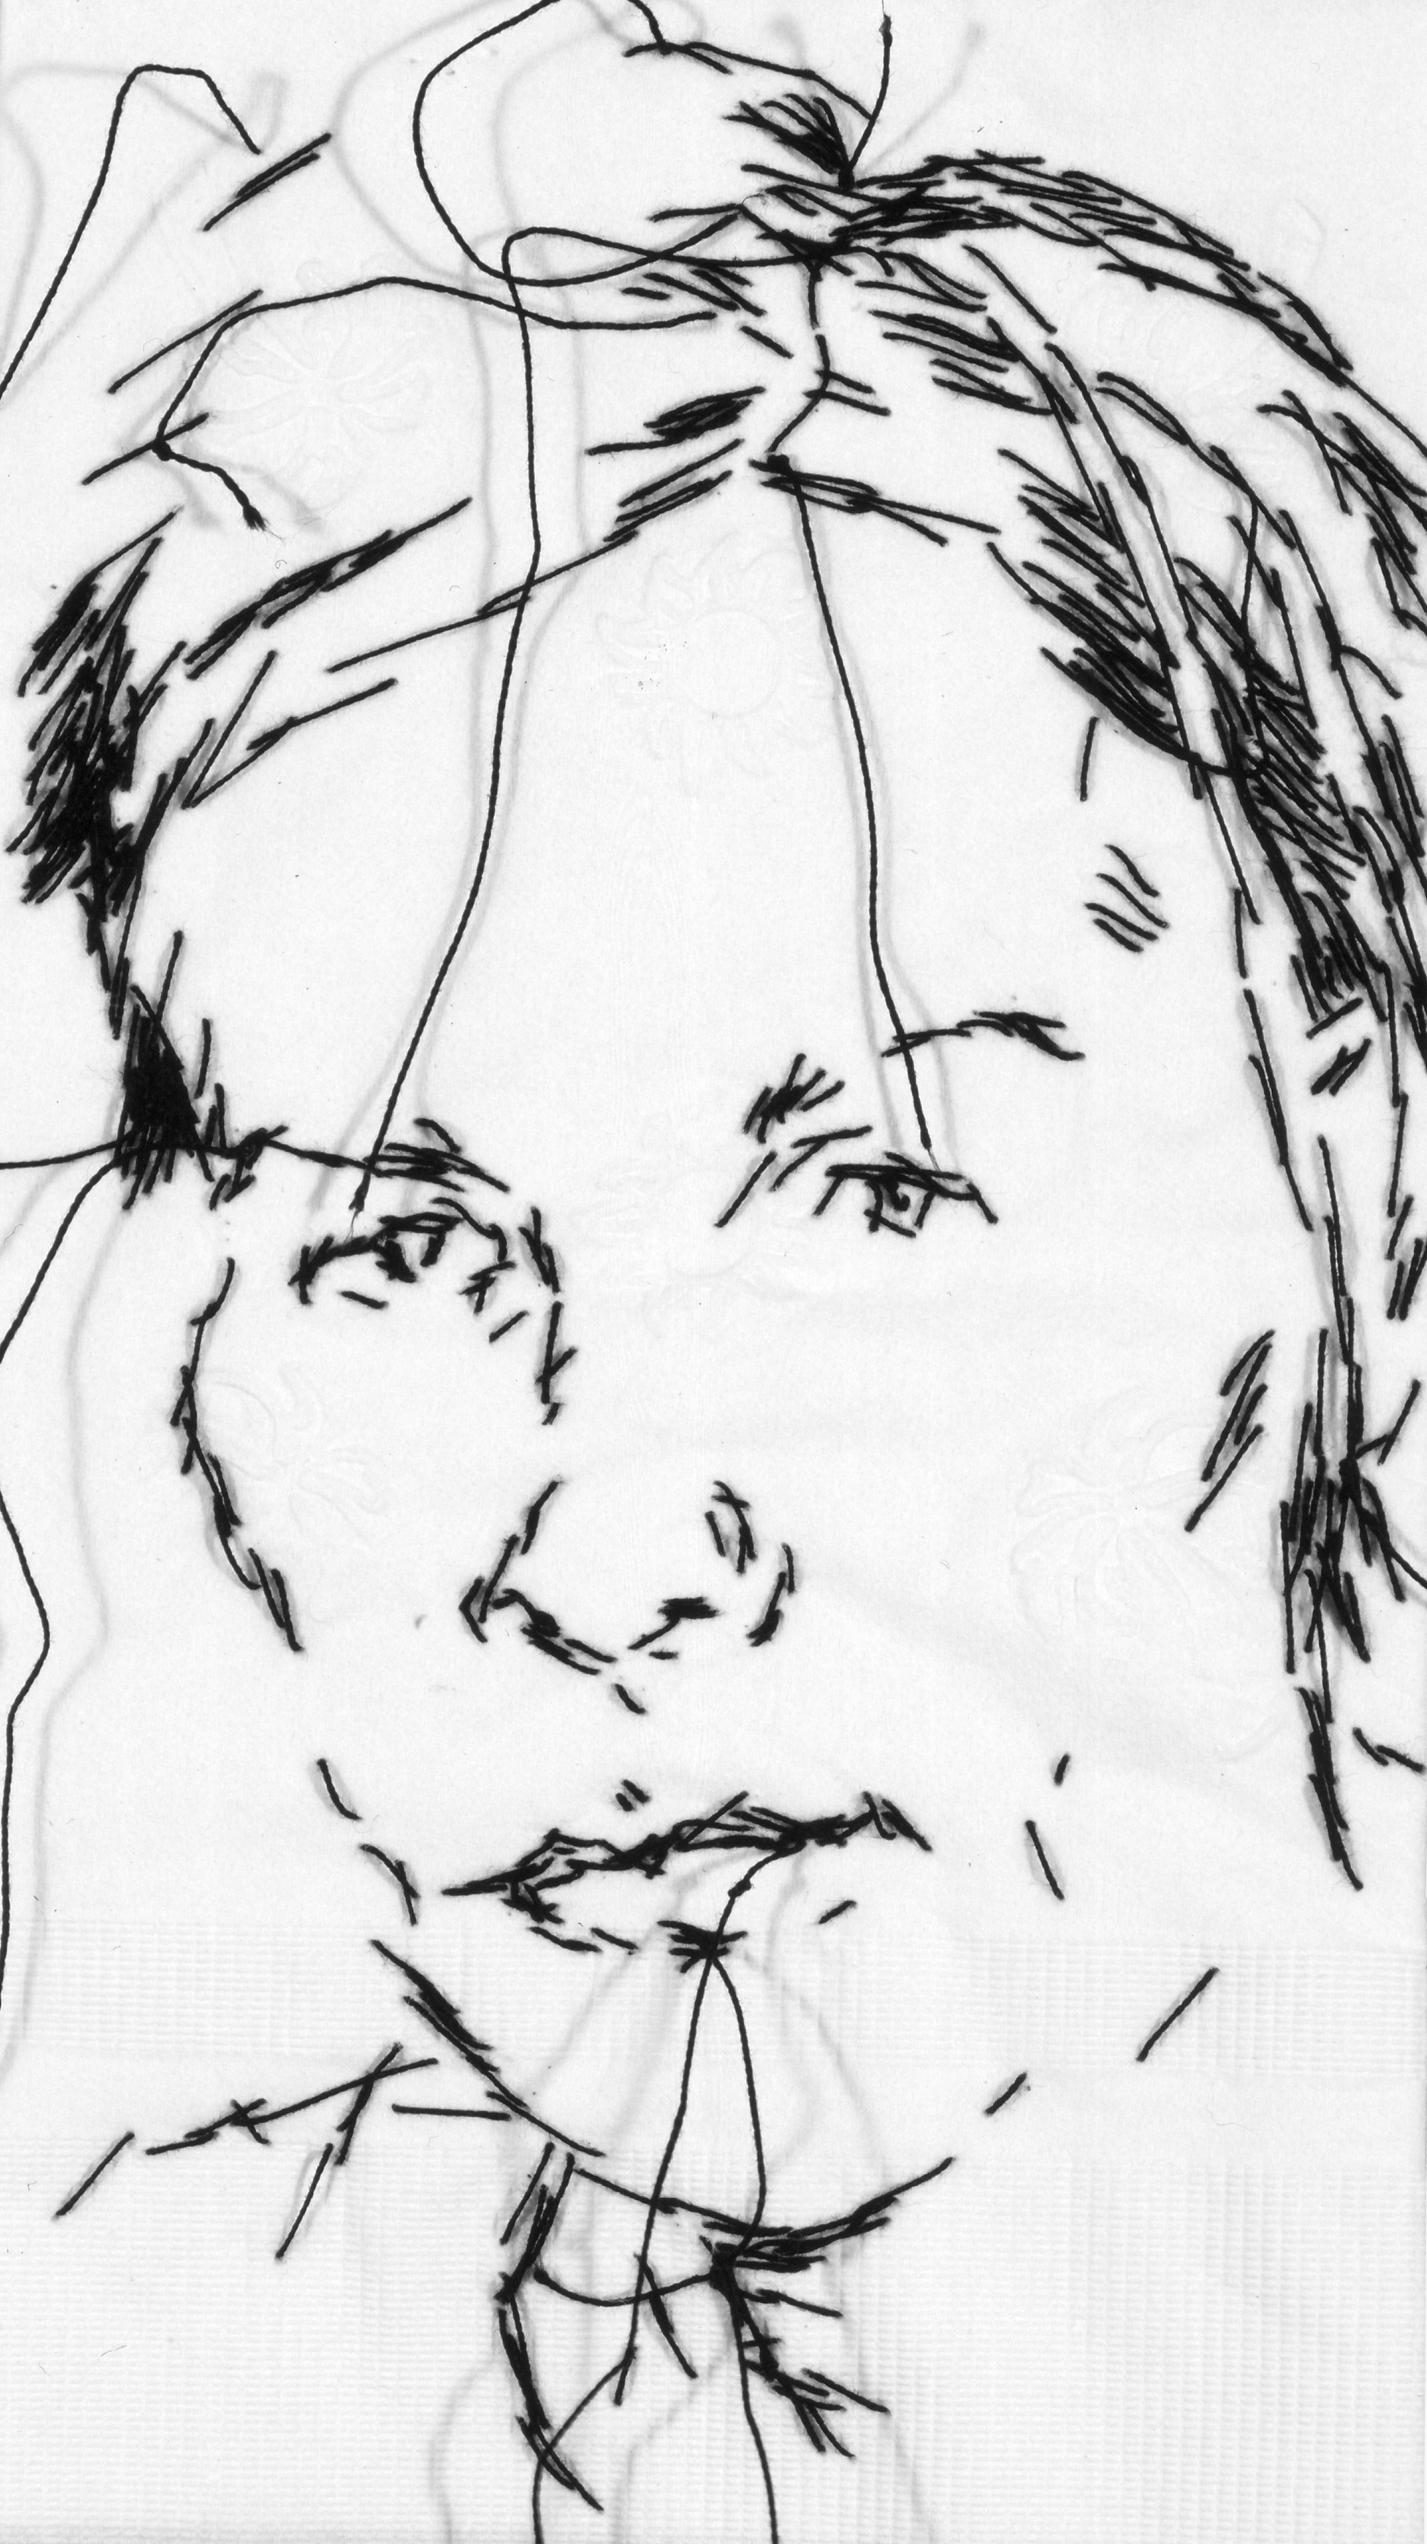 "Jes  Black thread on paper napkin, 7"" x 4"", 2007"